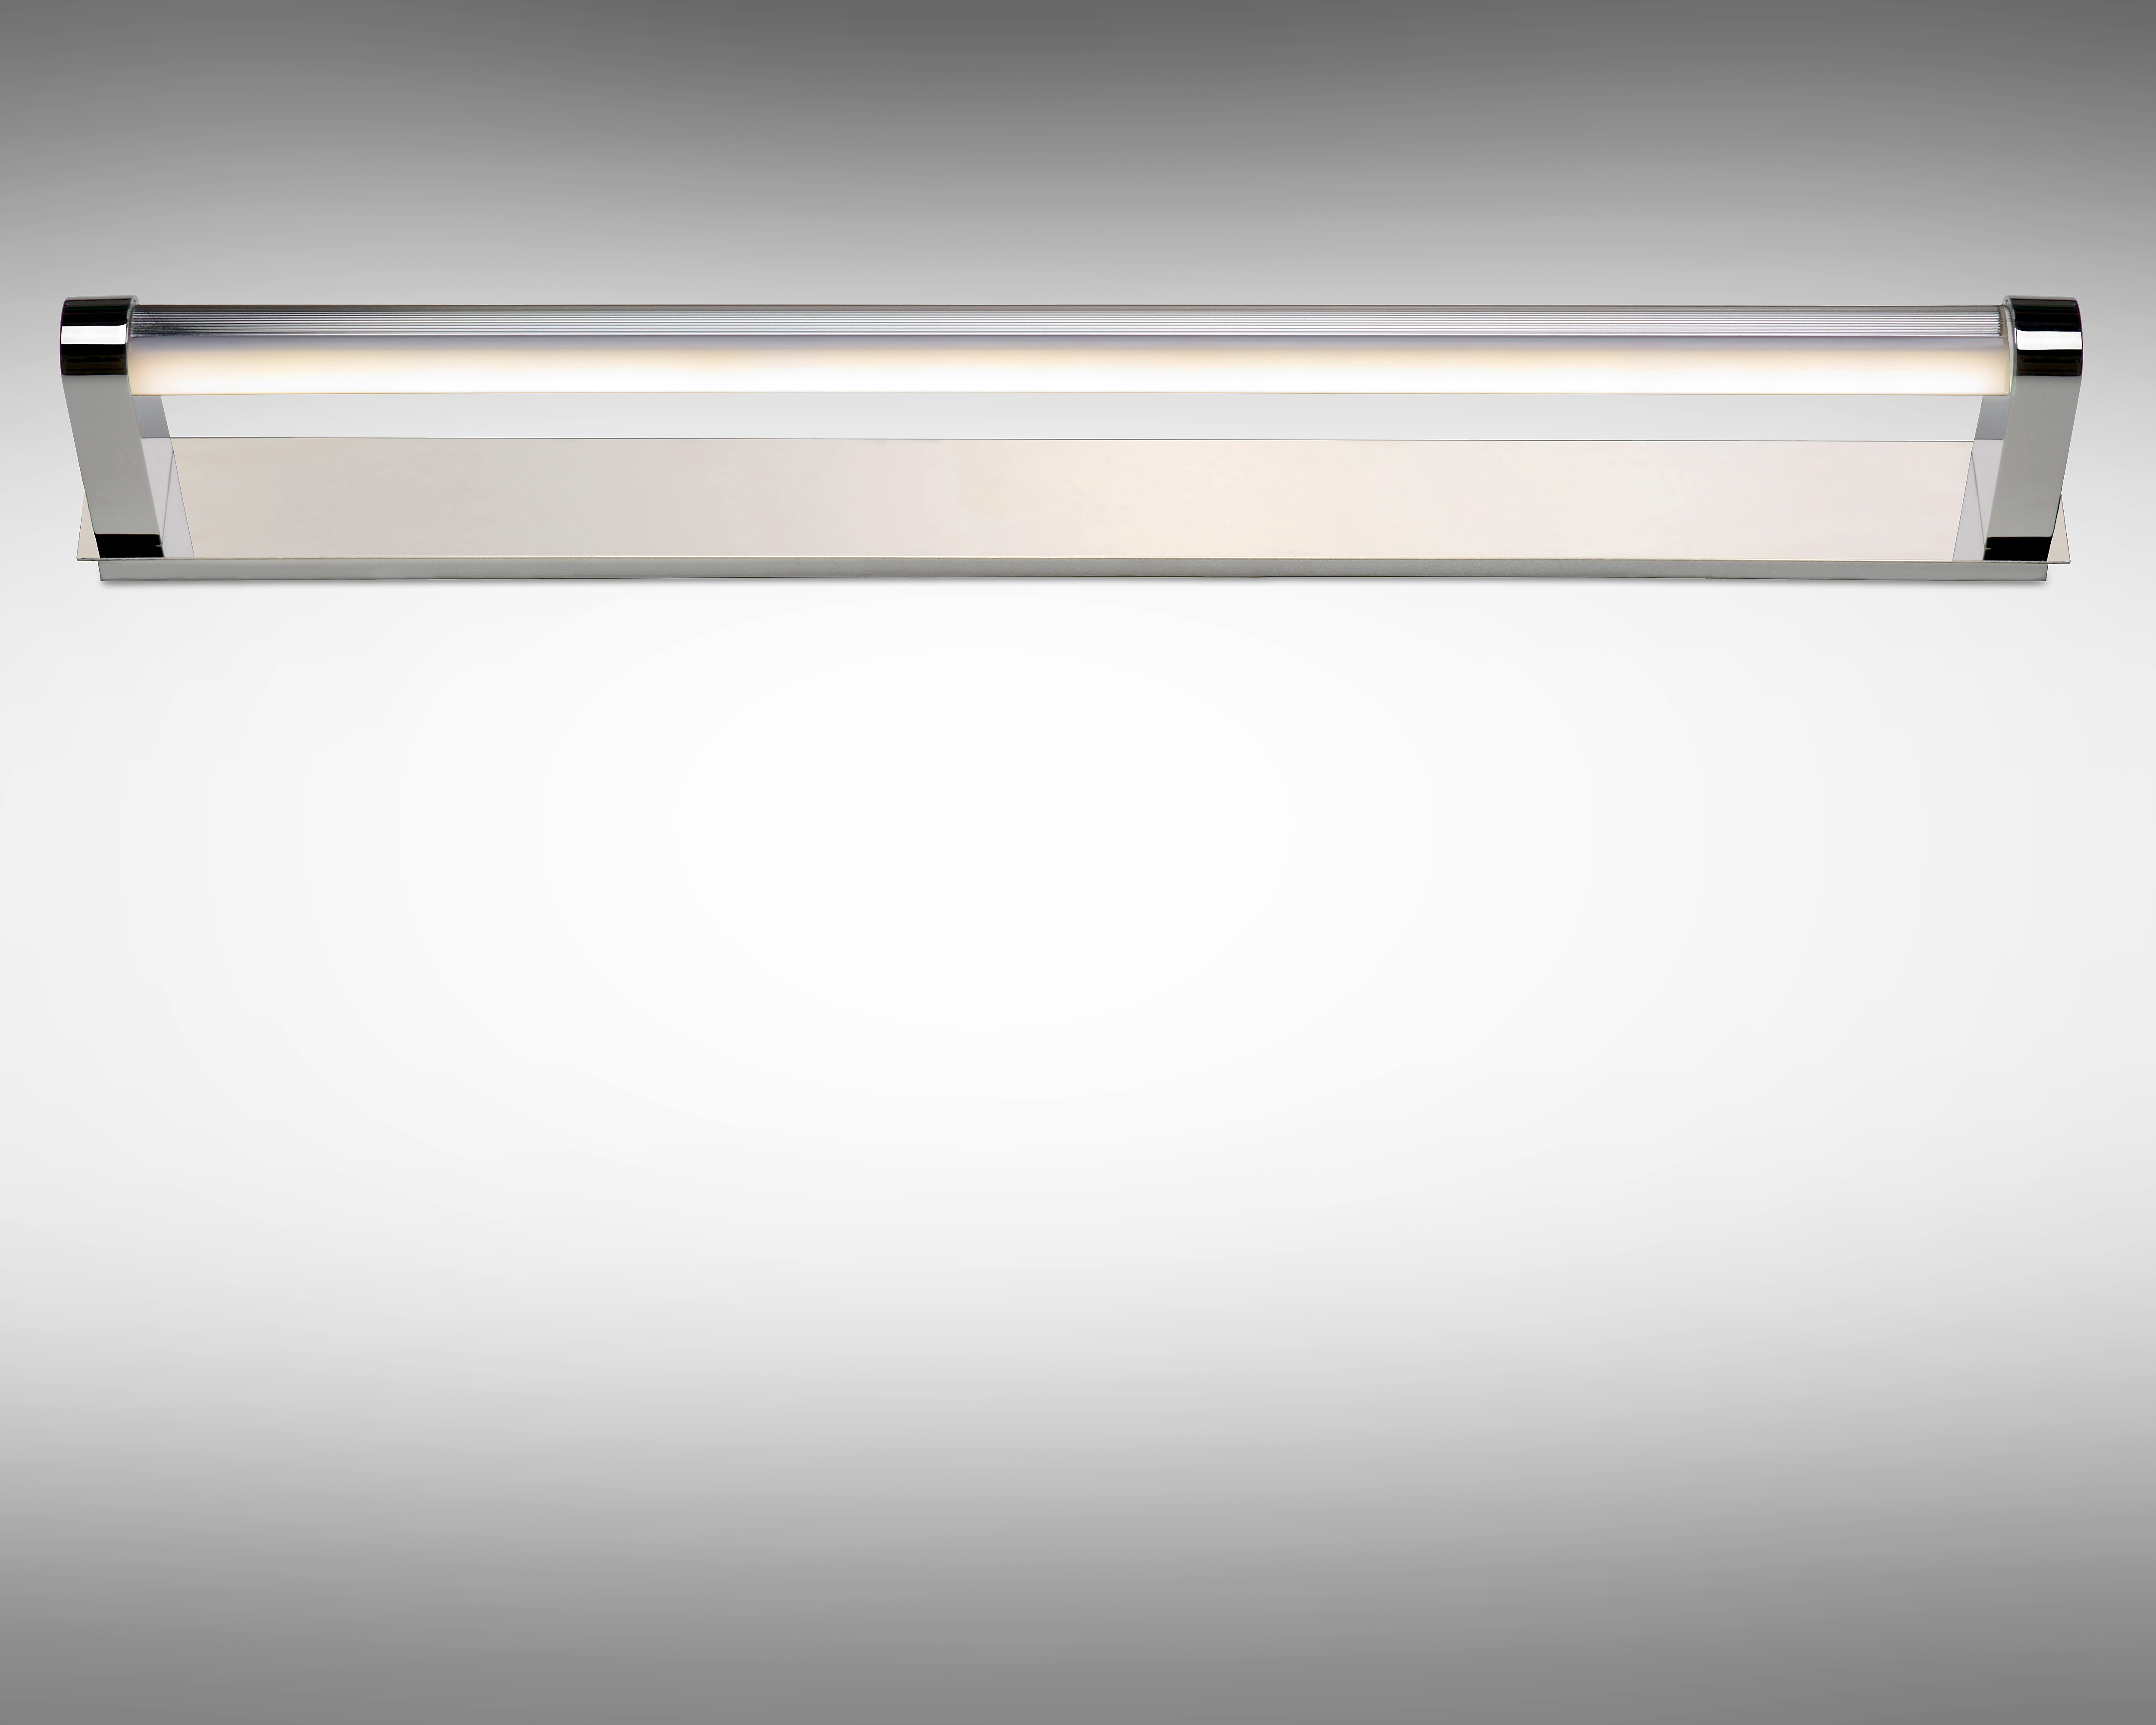 Spiegellamp Voor Badkamer : Alpa led spiegellamp badkamer led w k ip chroom